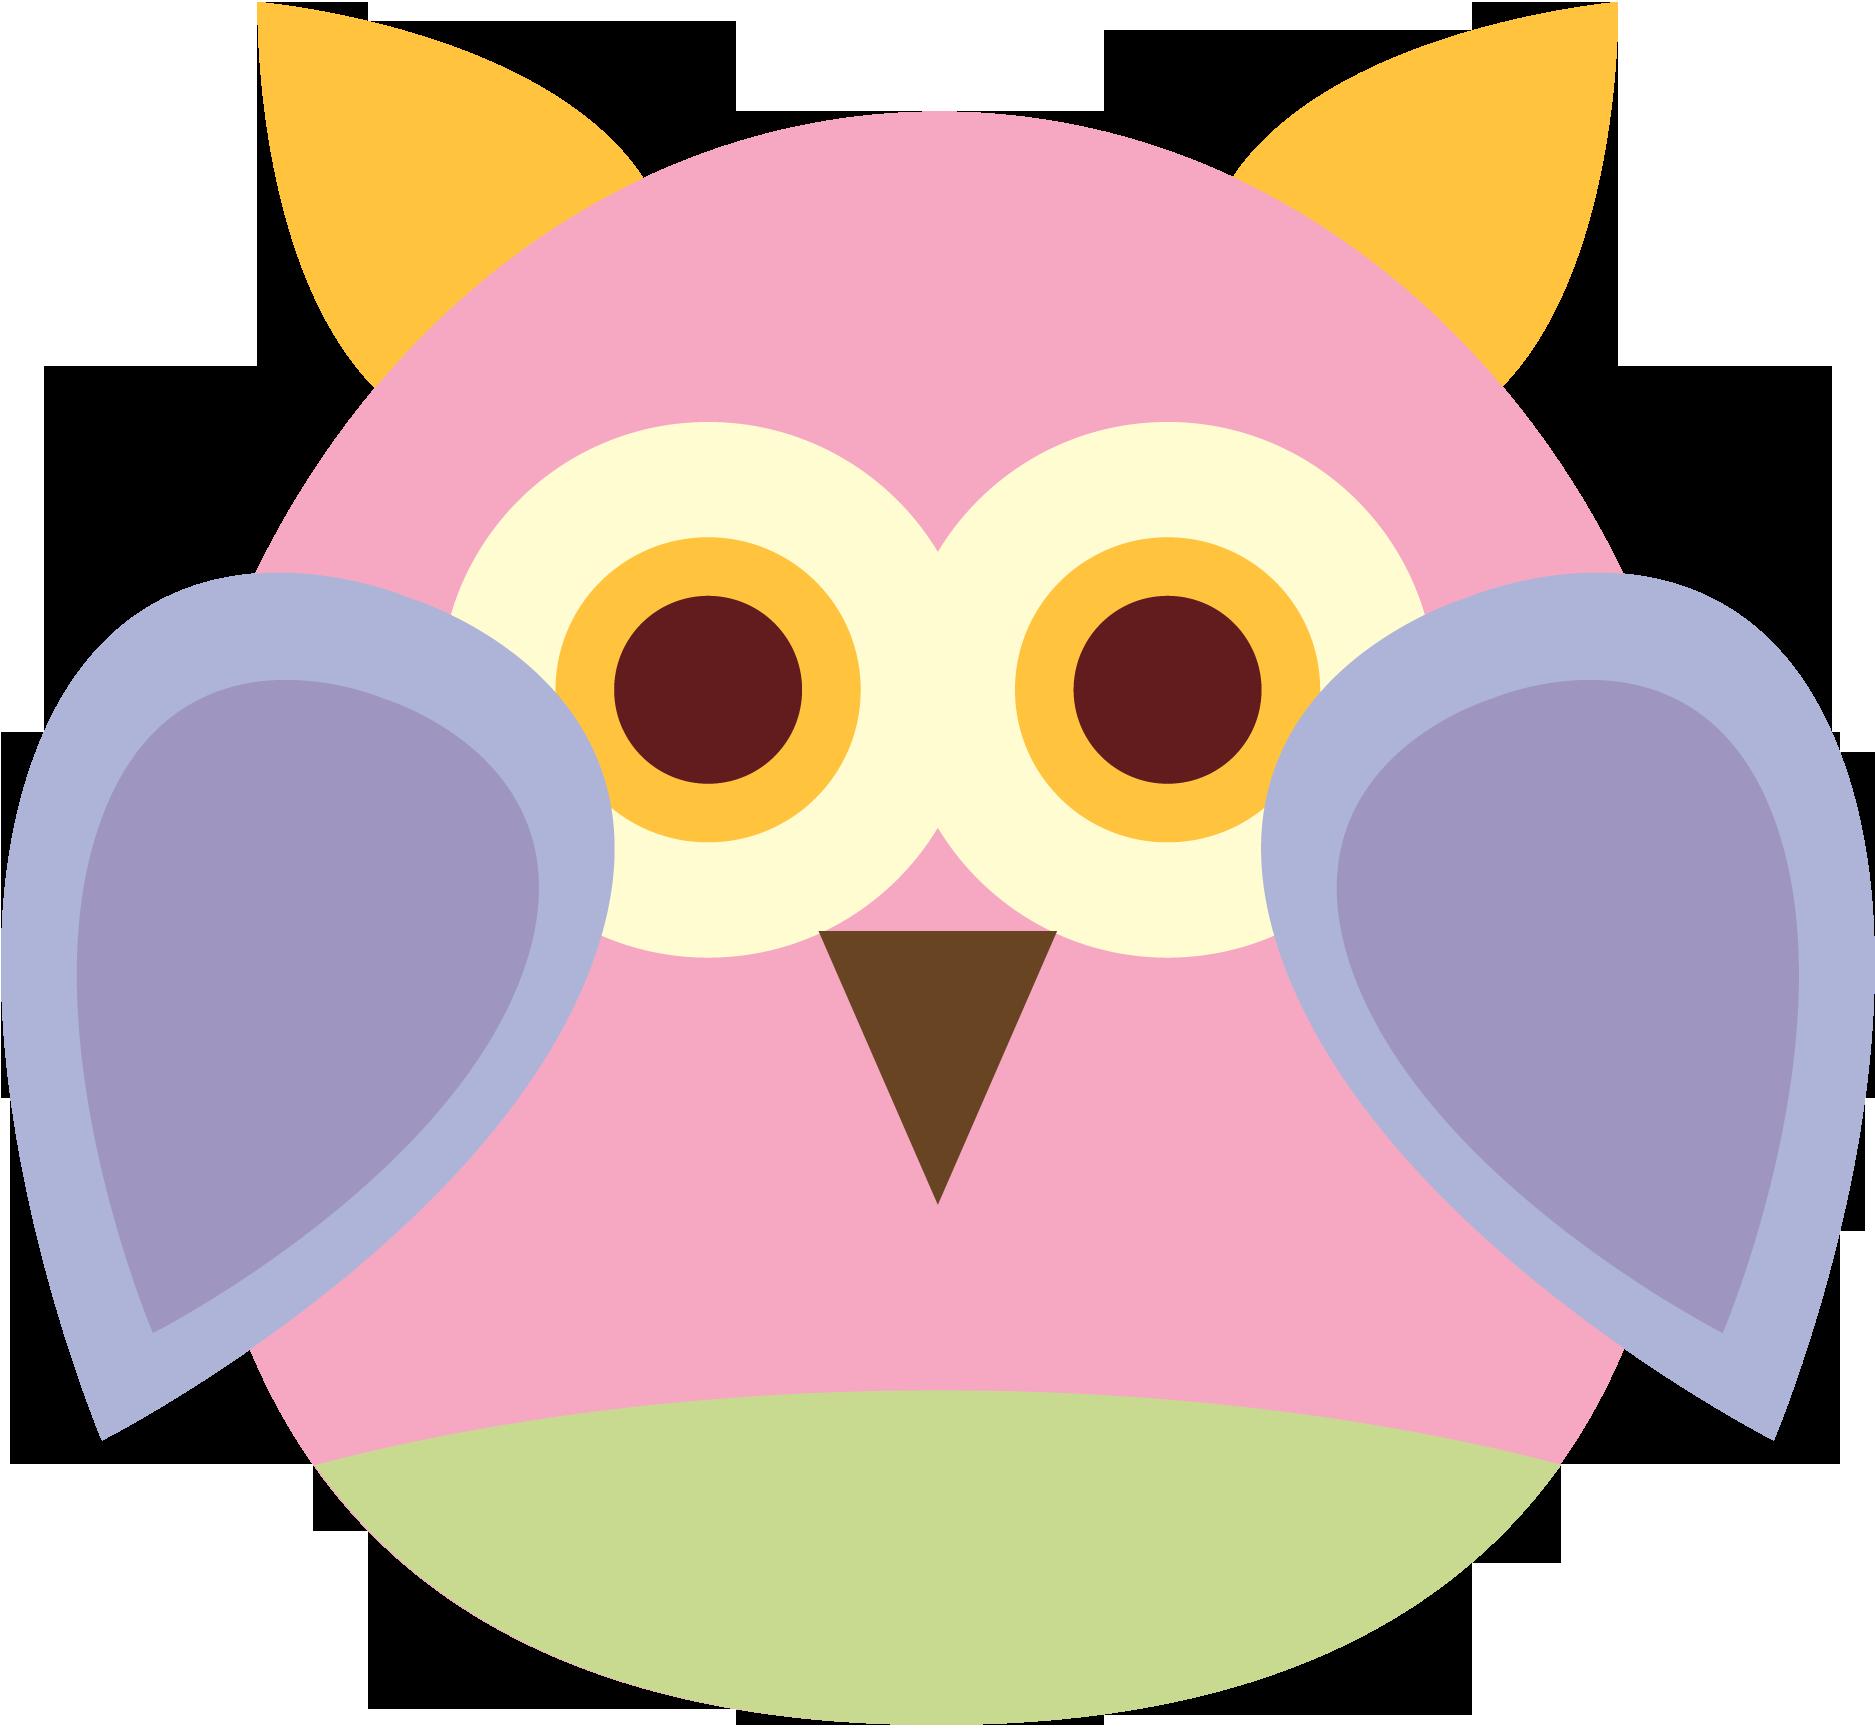 Owl Clip Art Free Download - Cliparts.co